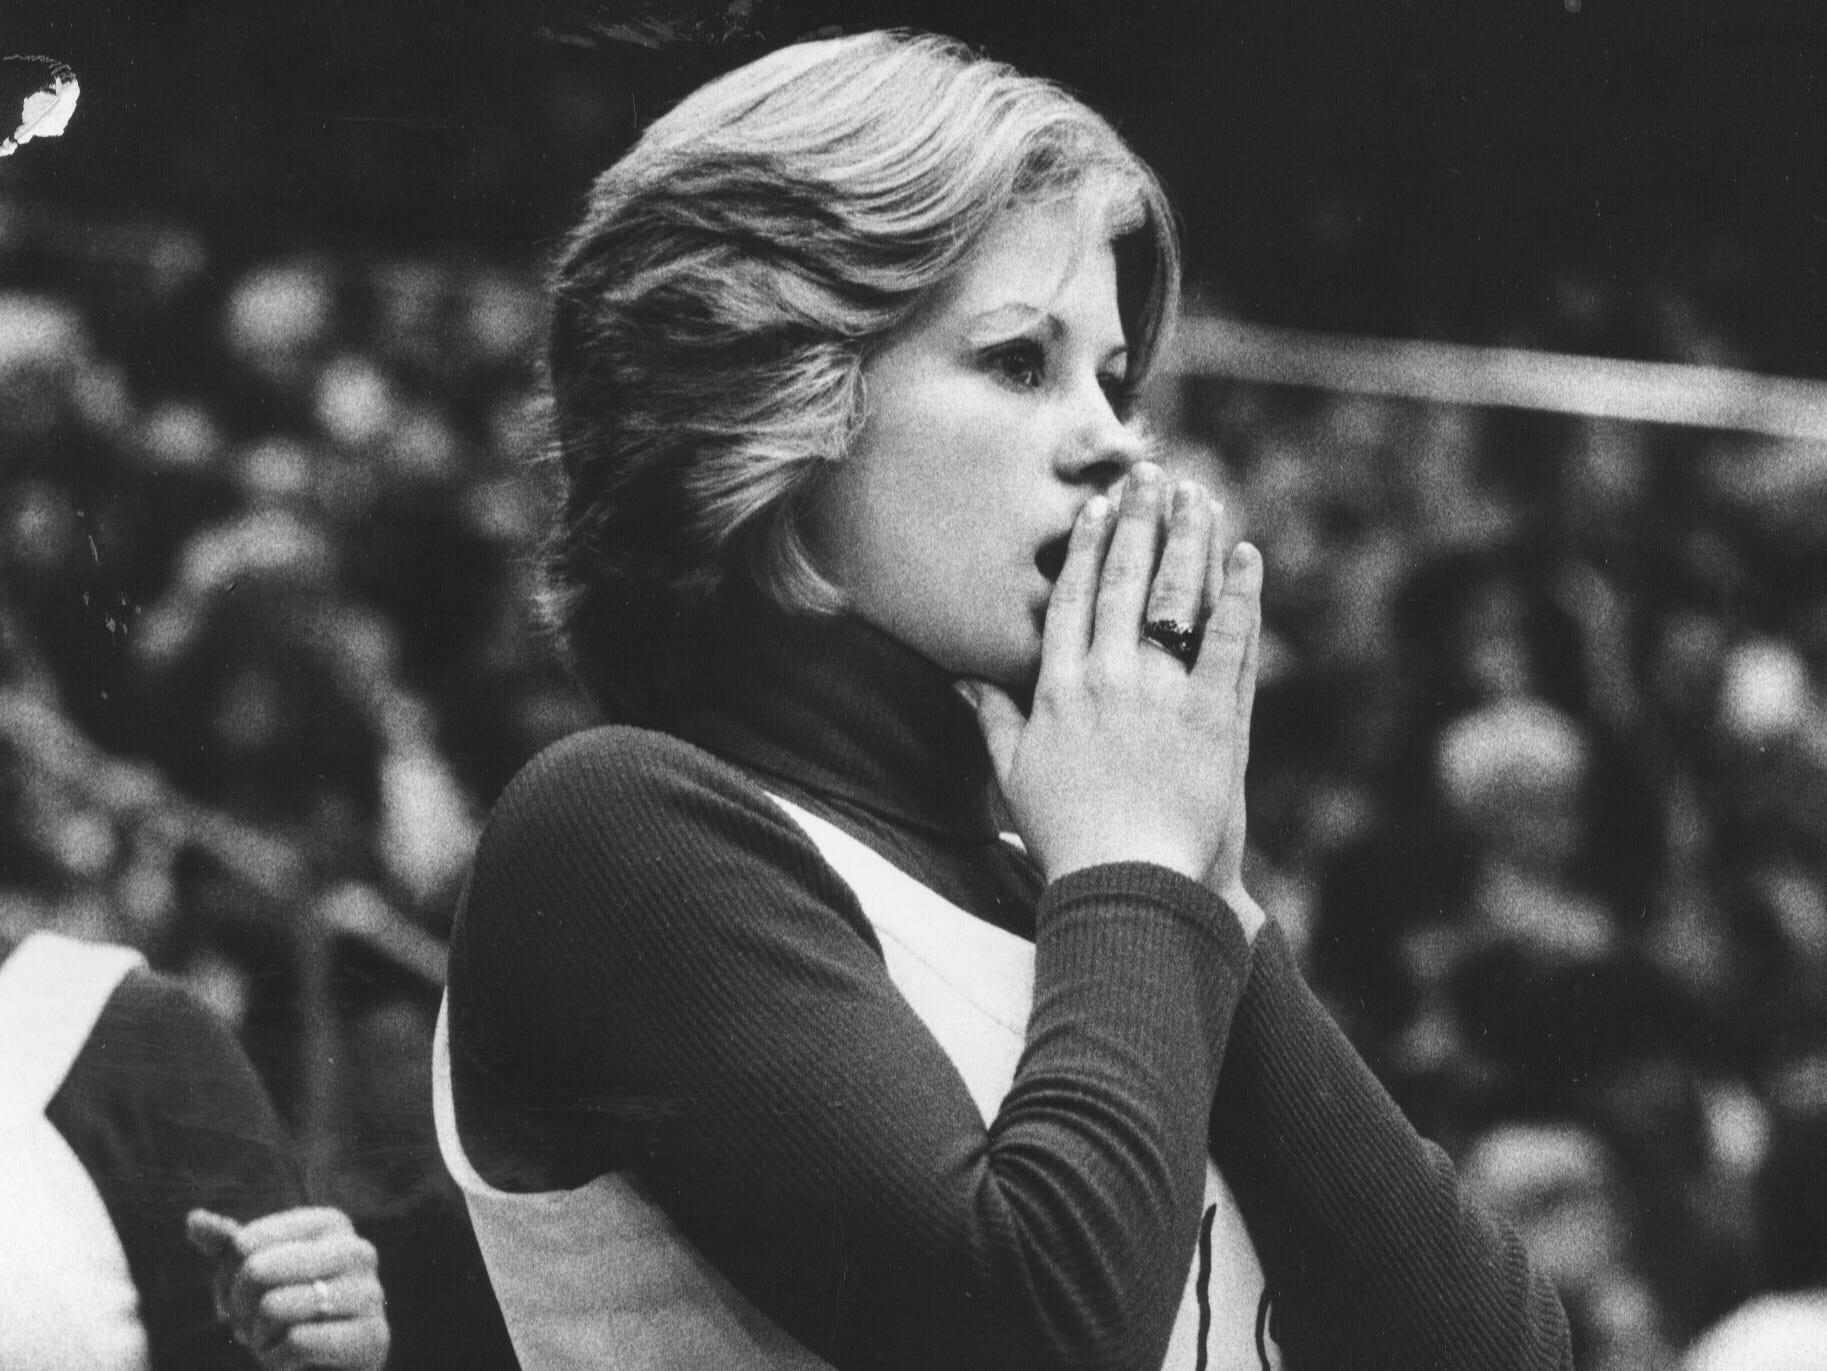 Jeffersonville cheerleader Sandy Kelly. Mar. 15, 1976